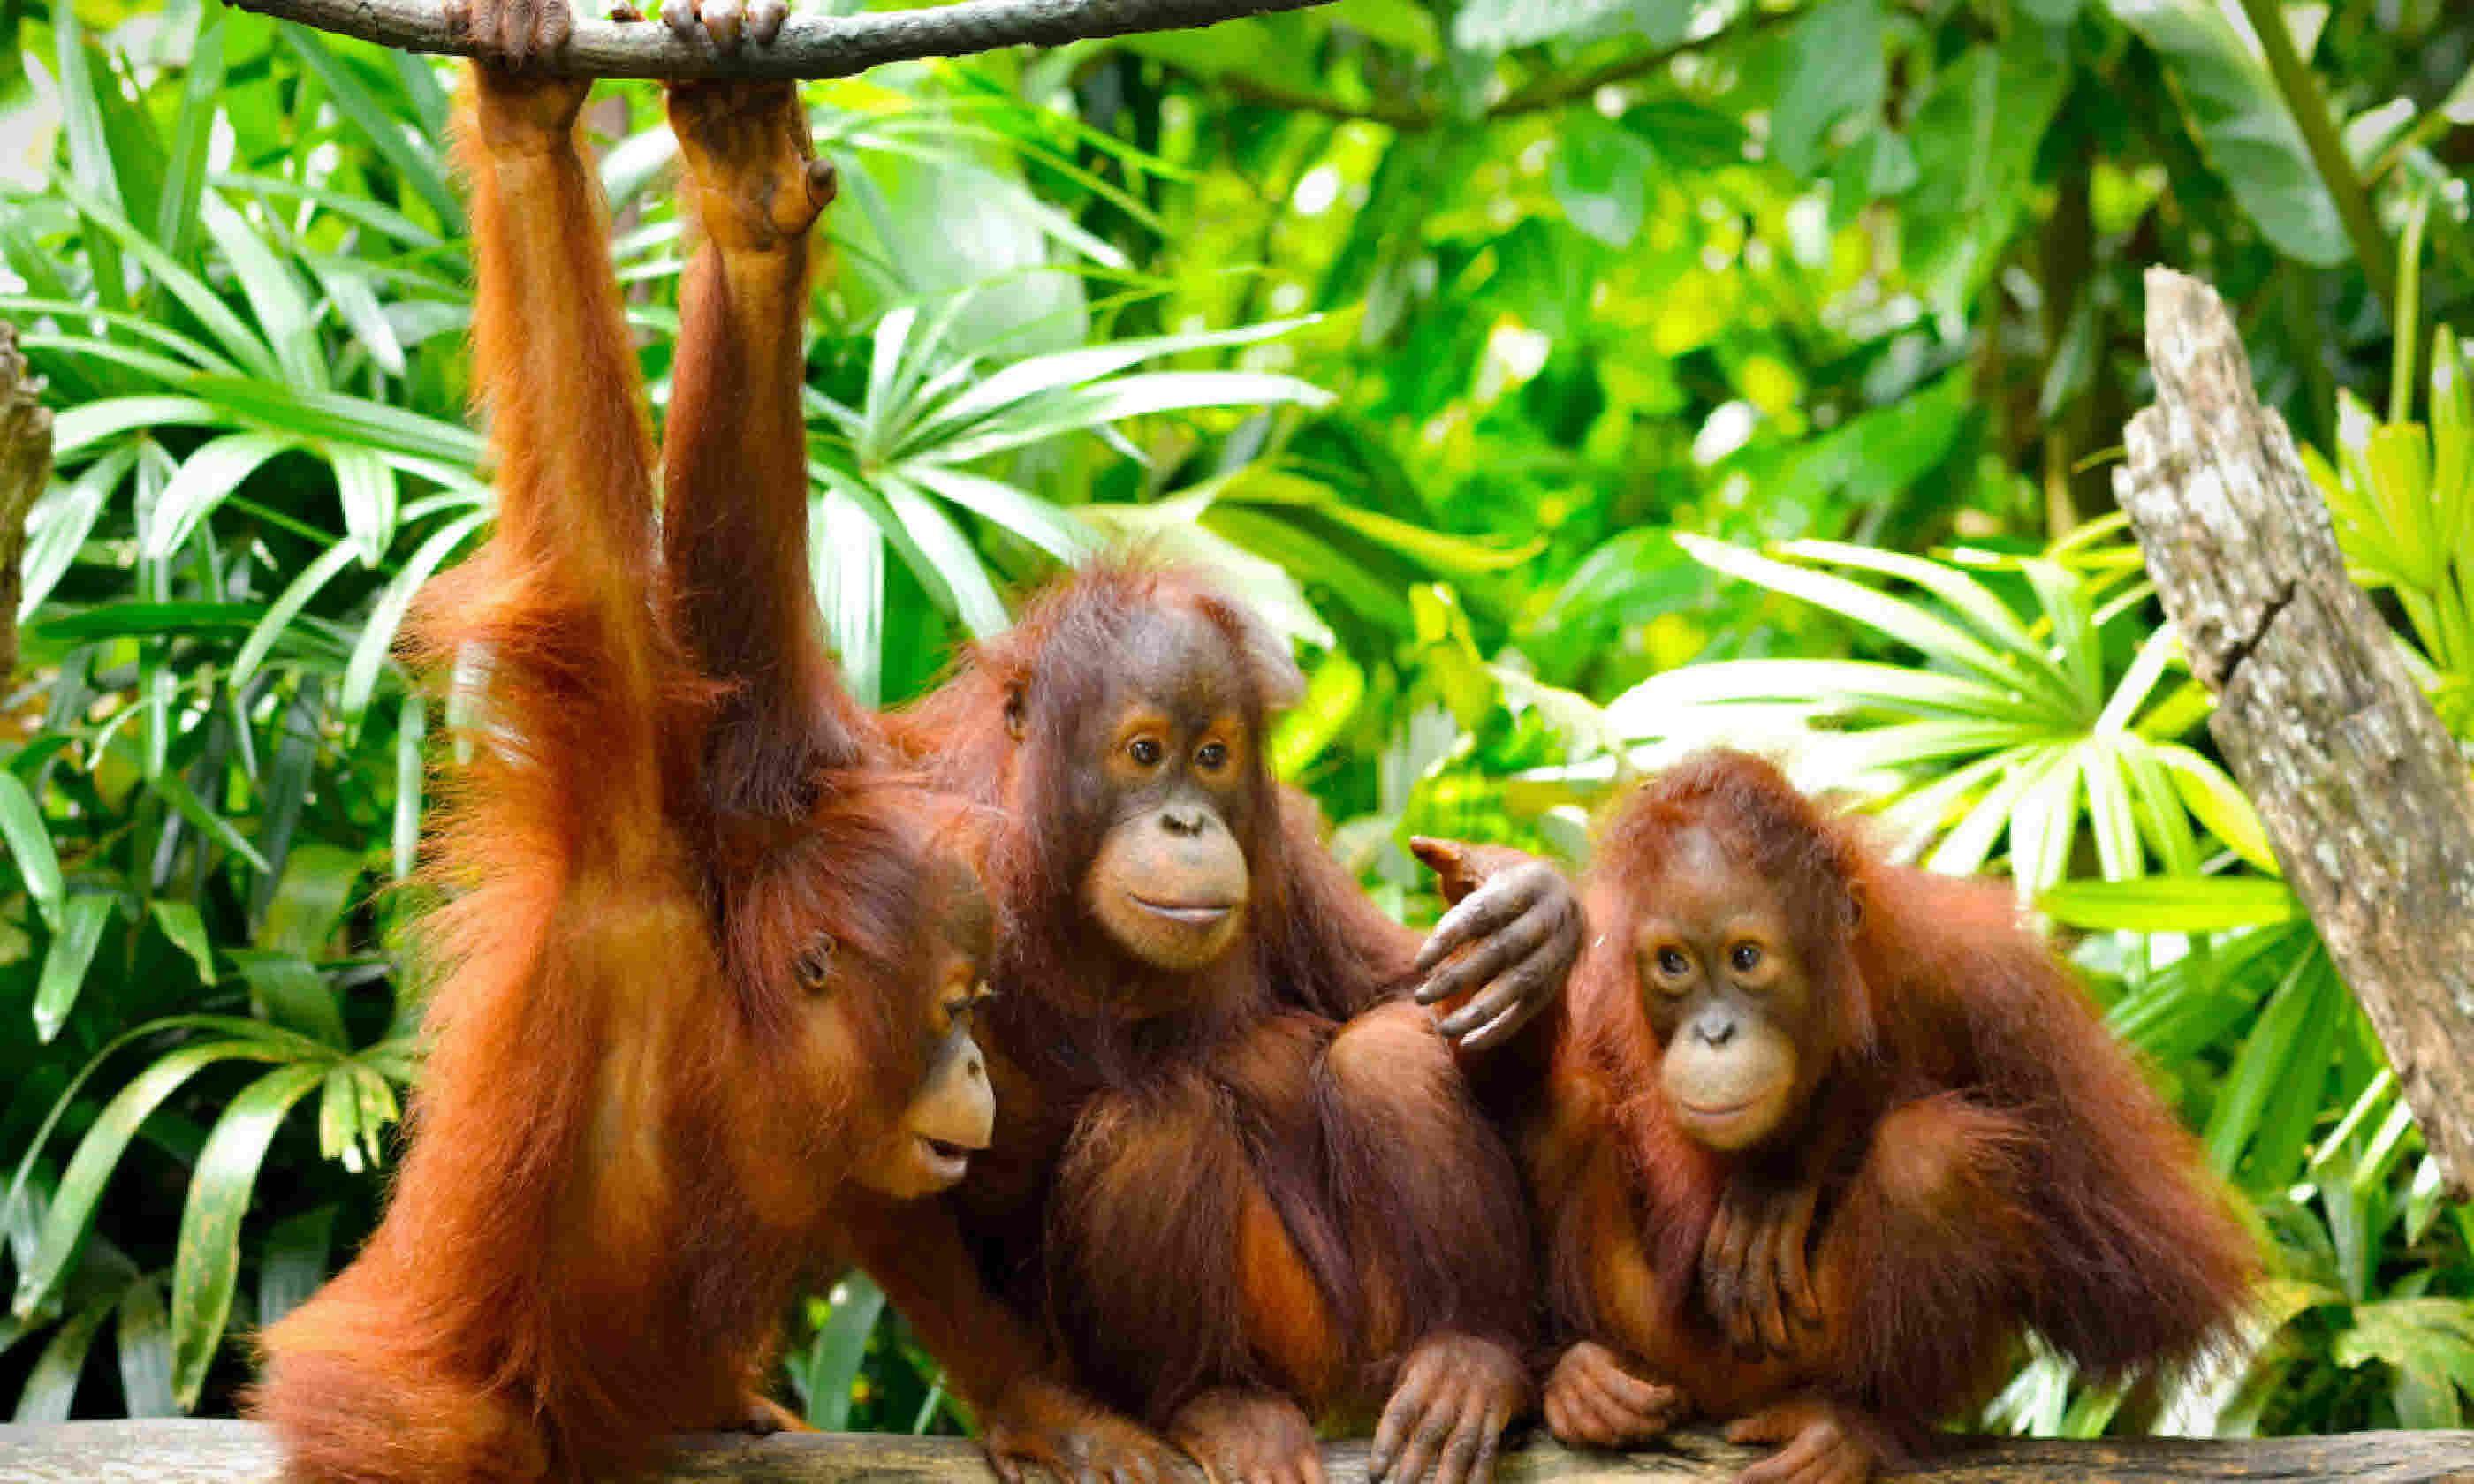 Group of orangutans (Shutterstock)